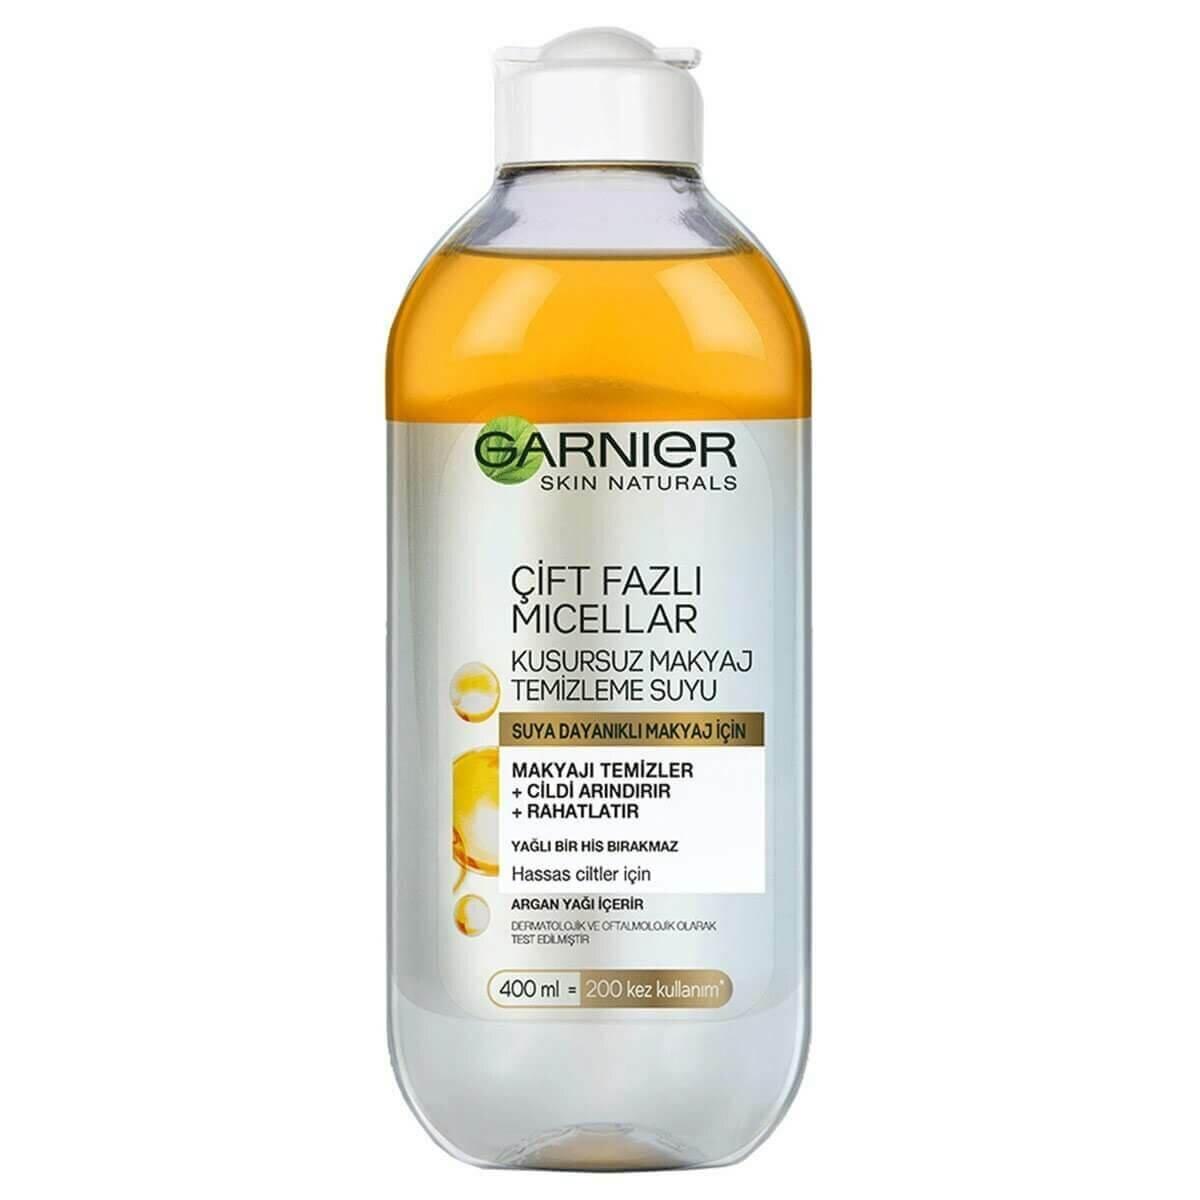 Micellar Oil Makyaj Temizleme Suyu 400ml